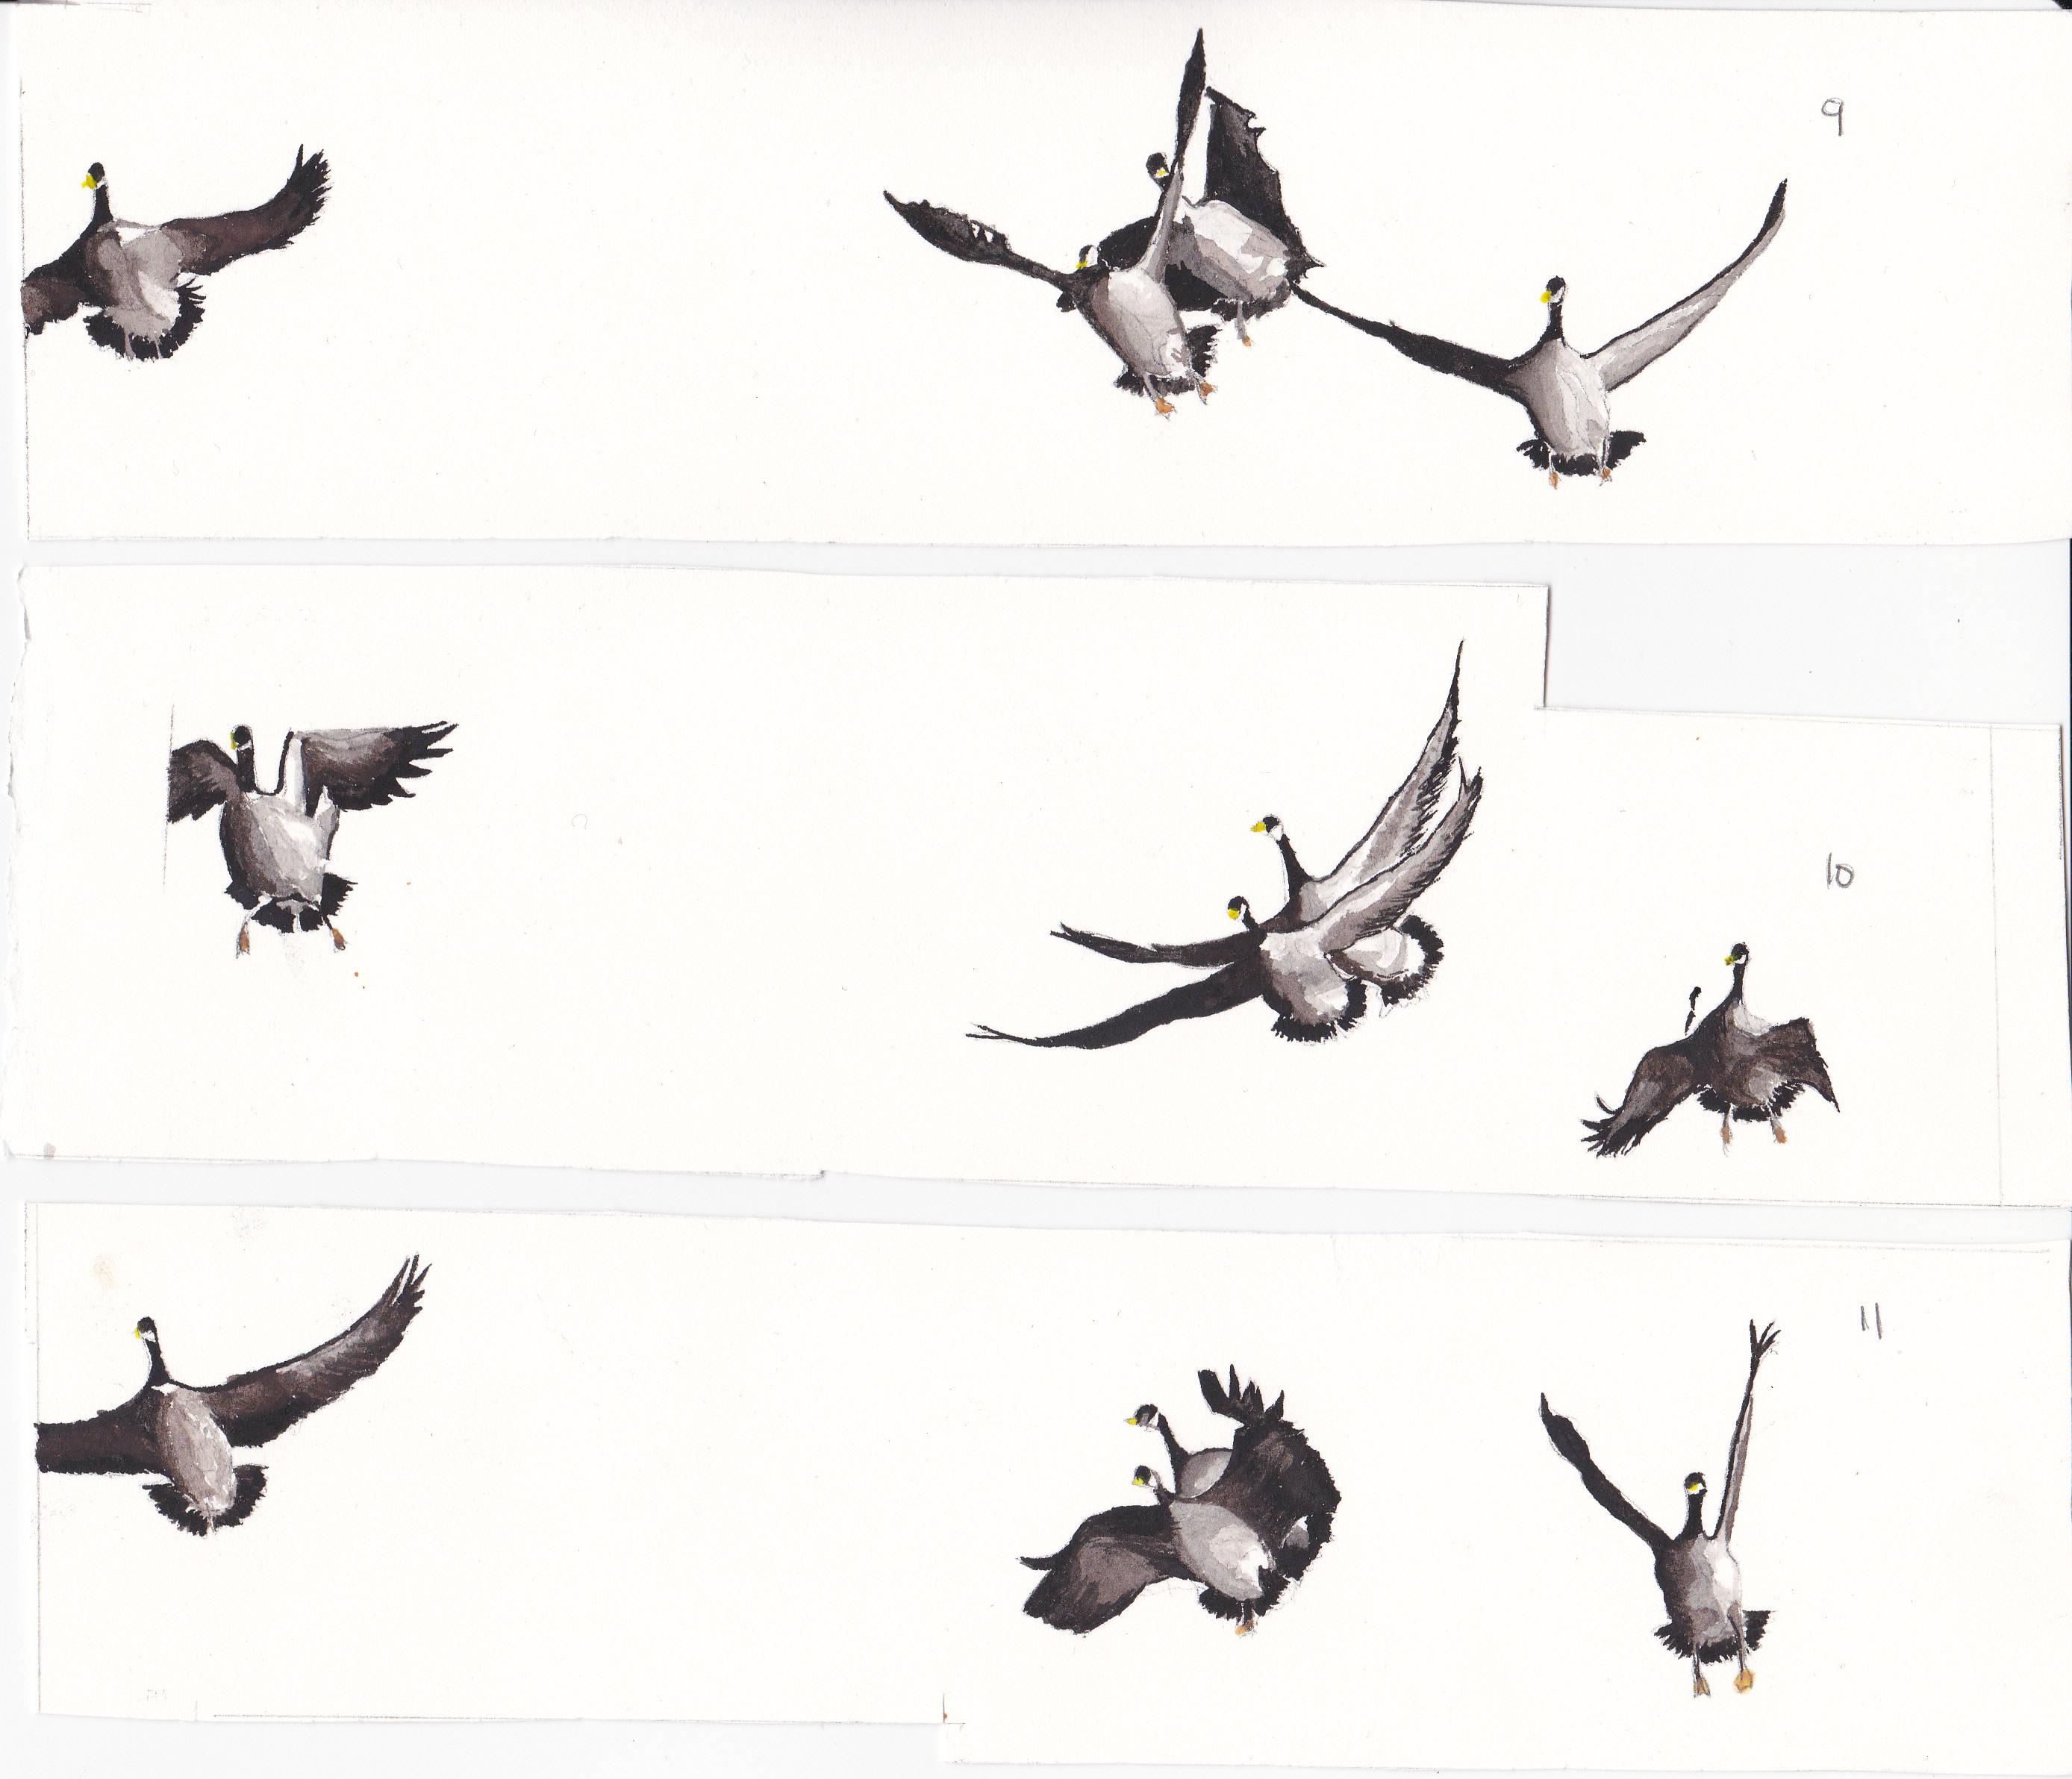 Elephant-Room-Studio-hunting-by-Emily-Liu-frame-by-frame-animation ...